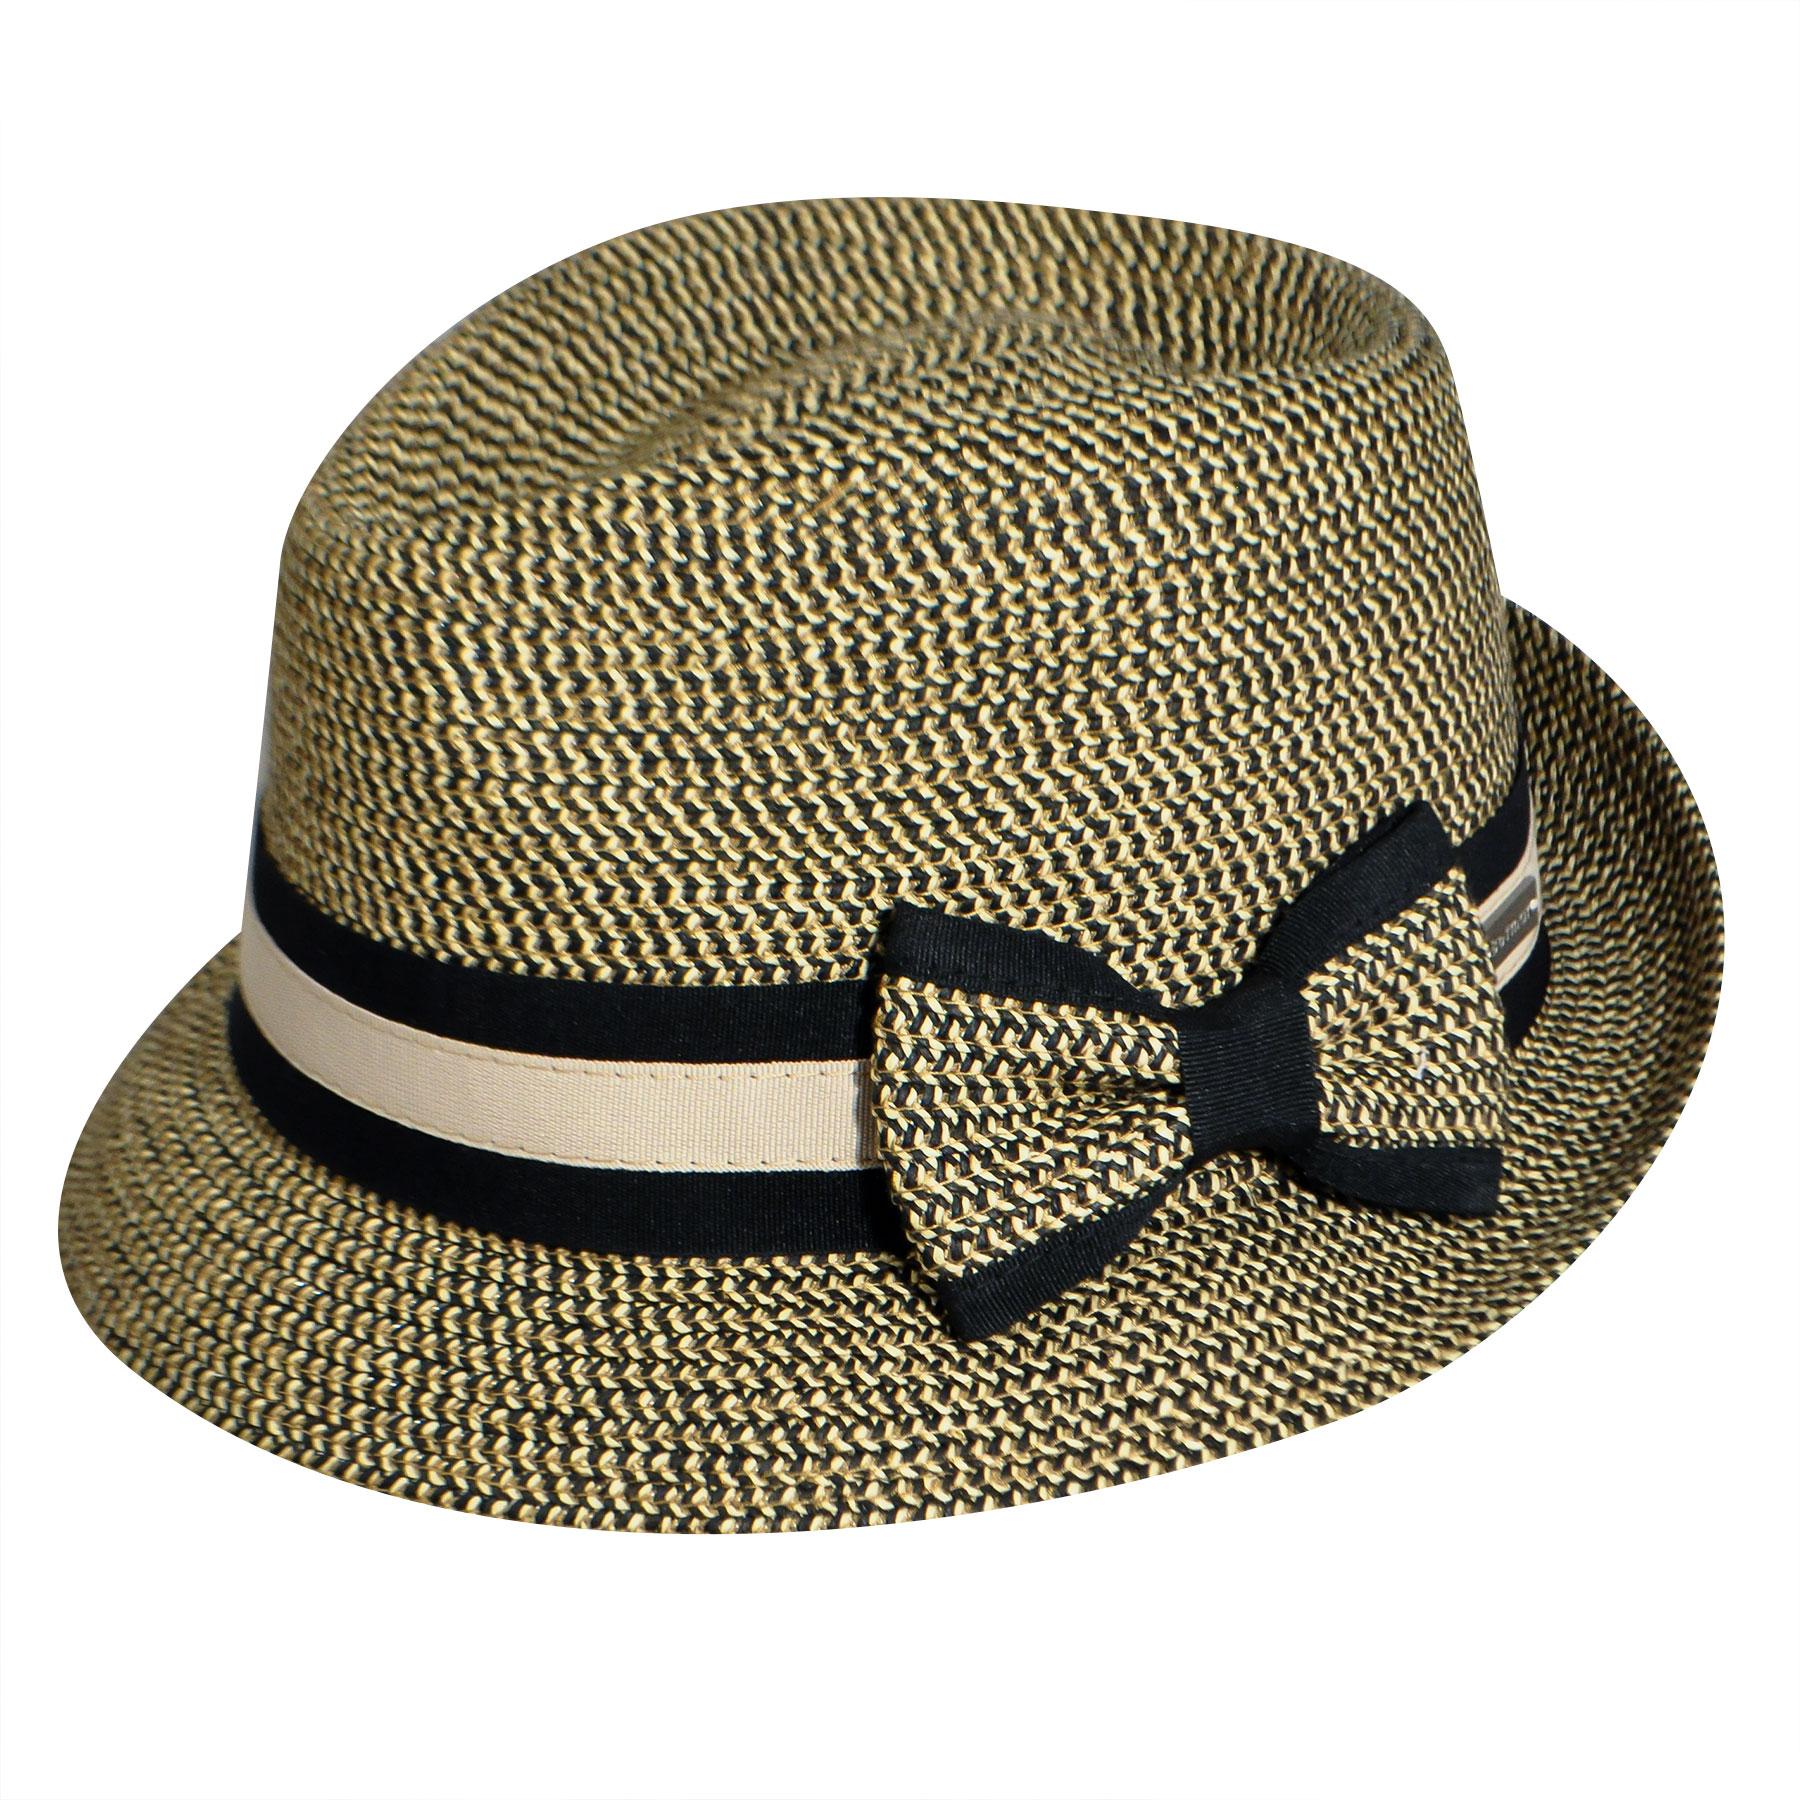 1920s Fashion & Clothing | Roaring 20s Attire Joanne Braided Trilby - Rattlesnake1SFM $29.25 AT vintagedancer.com